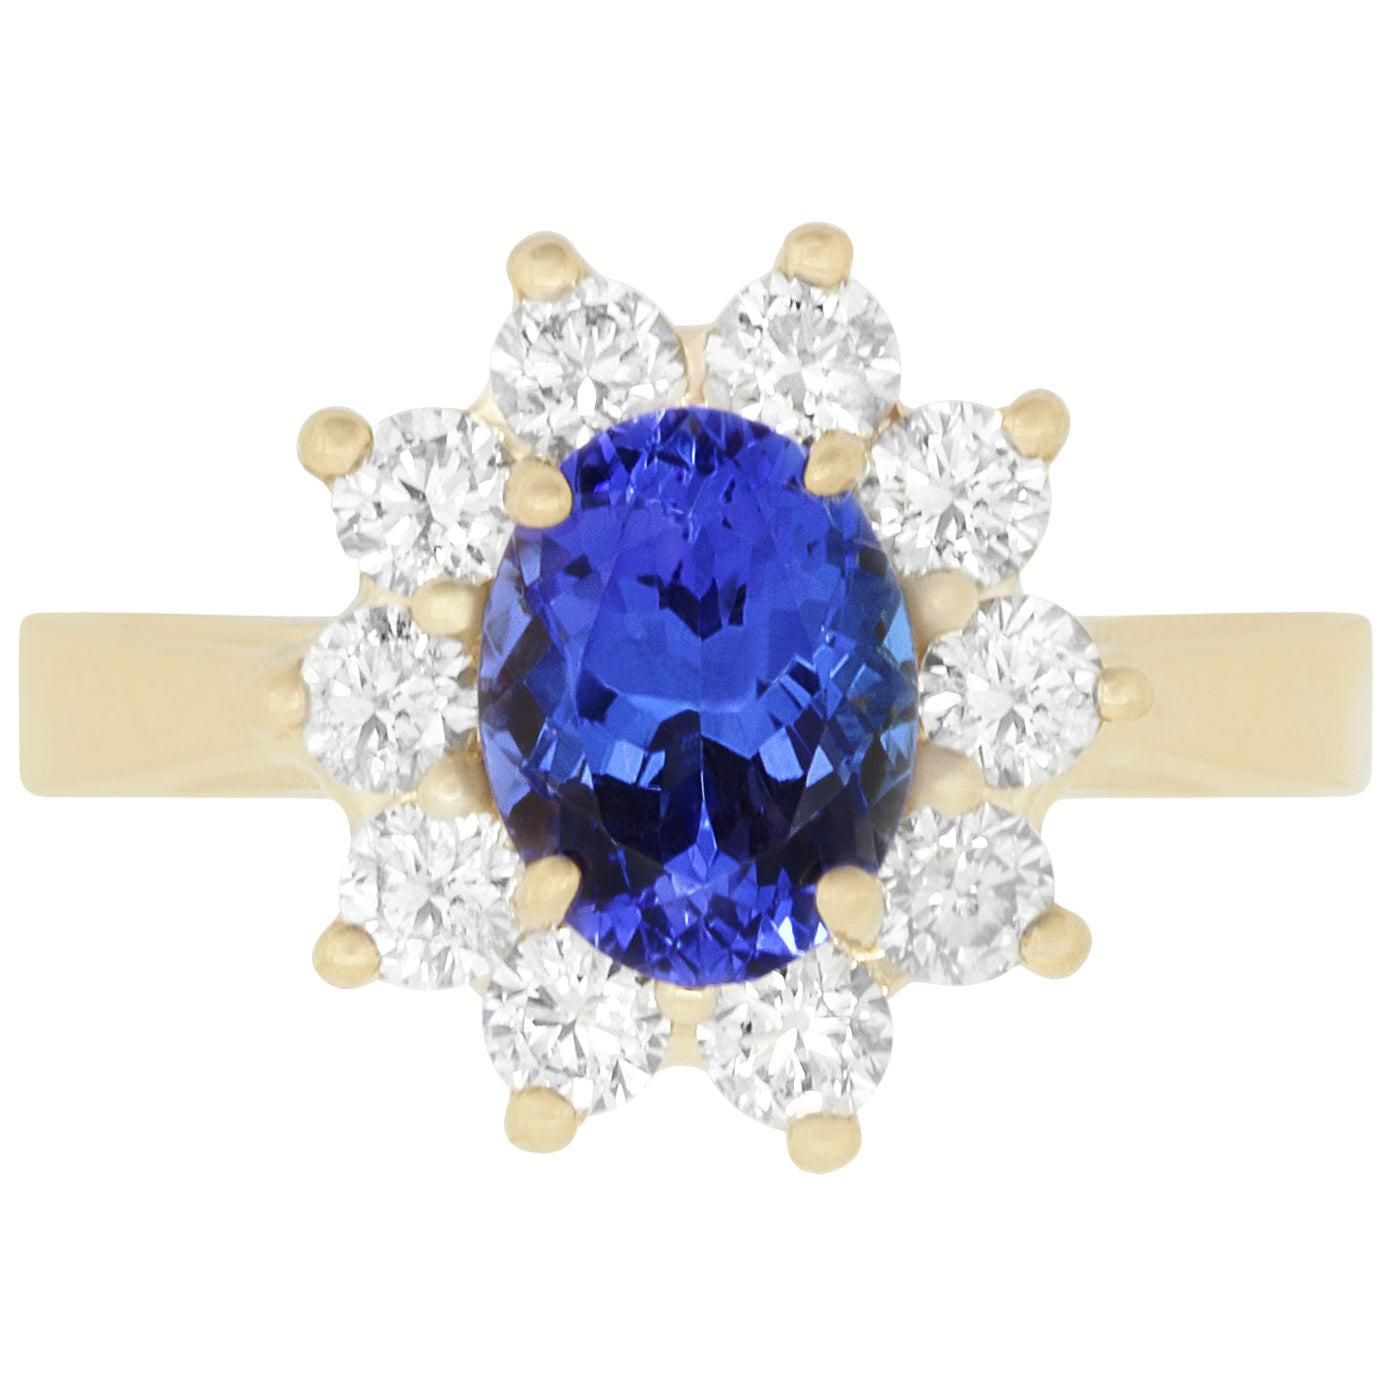 Oval Natural Tanzanite White Diamond Halo Engagement Ring 14K Yellow Gold